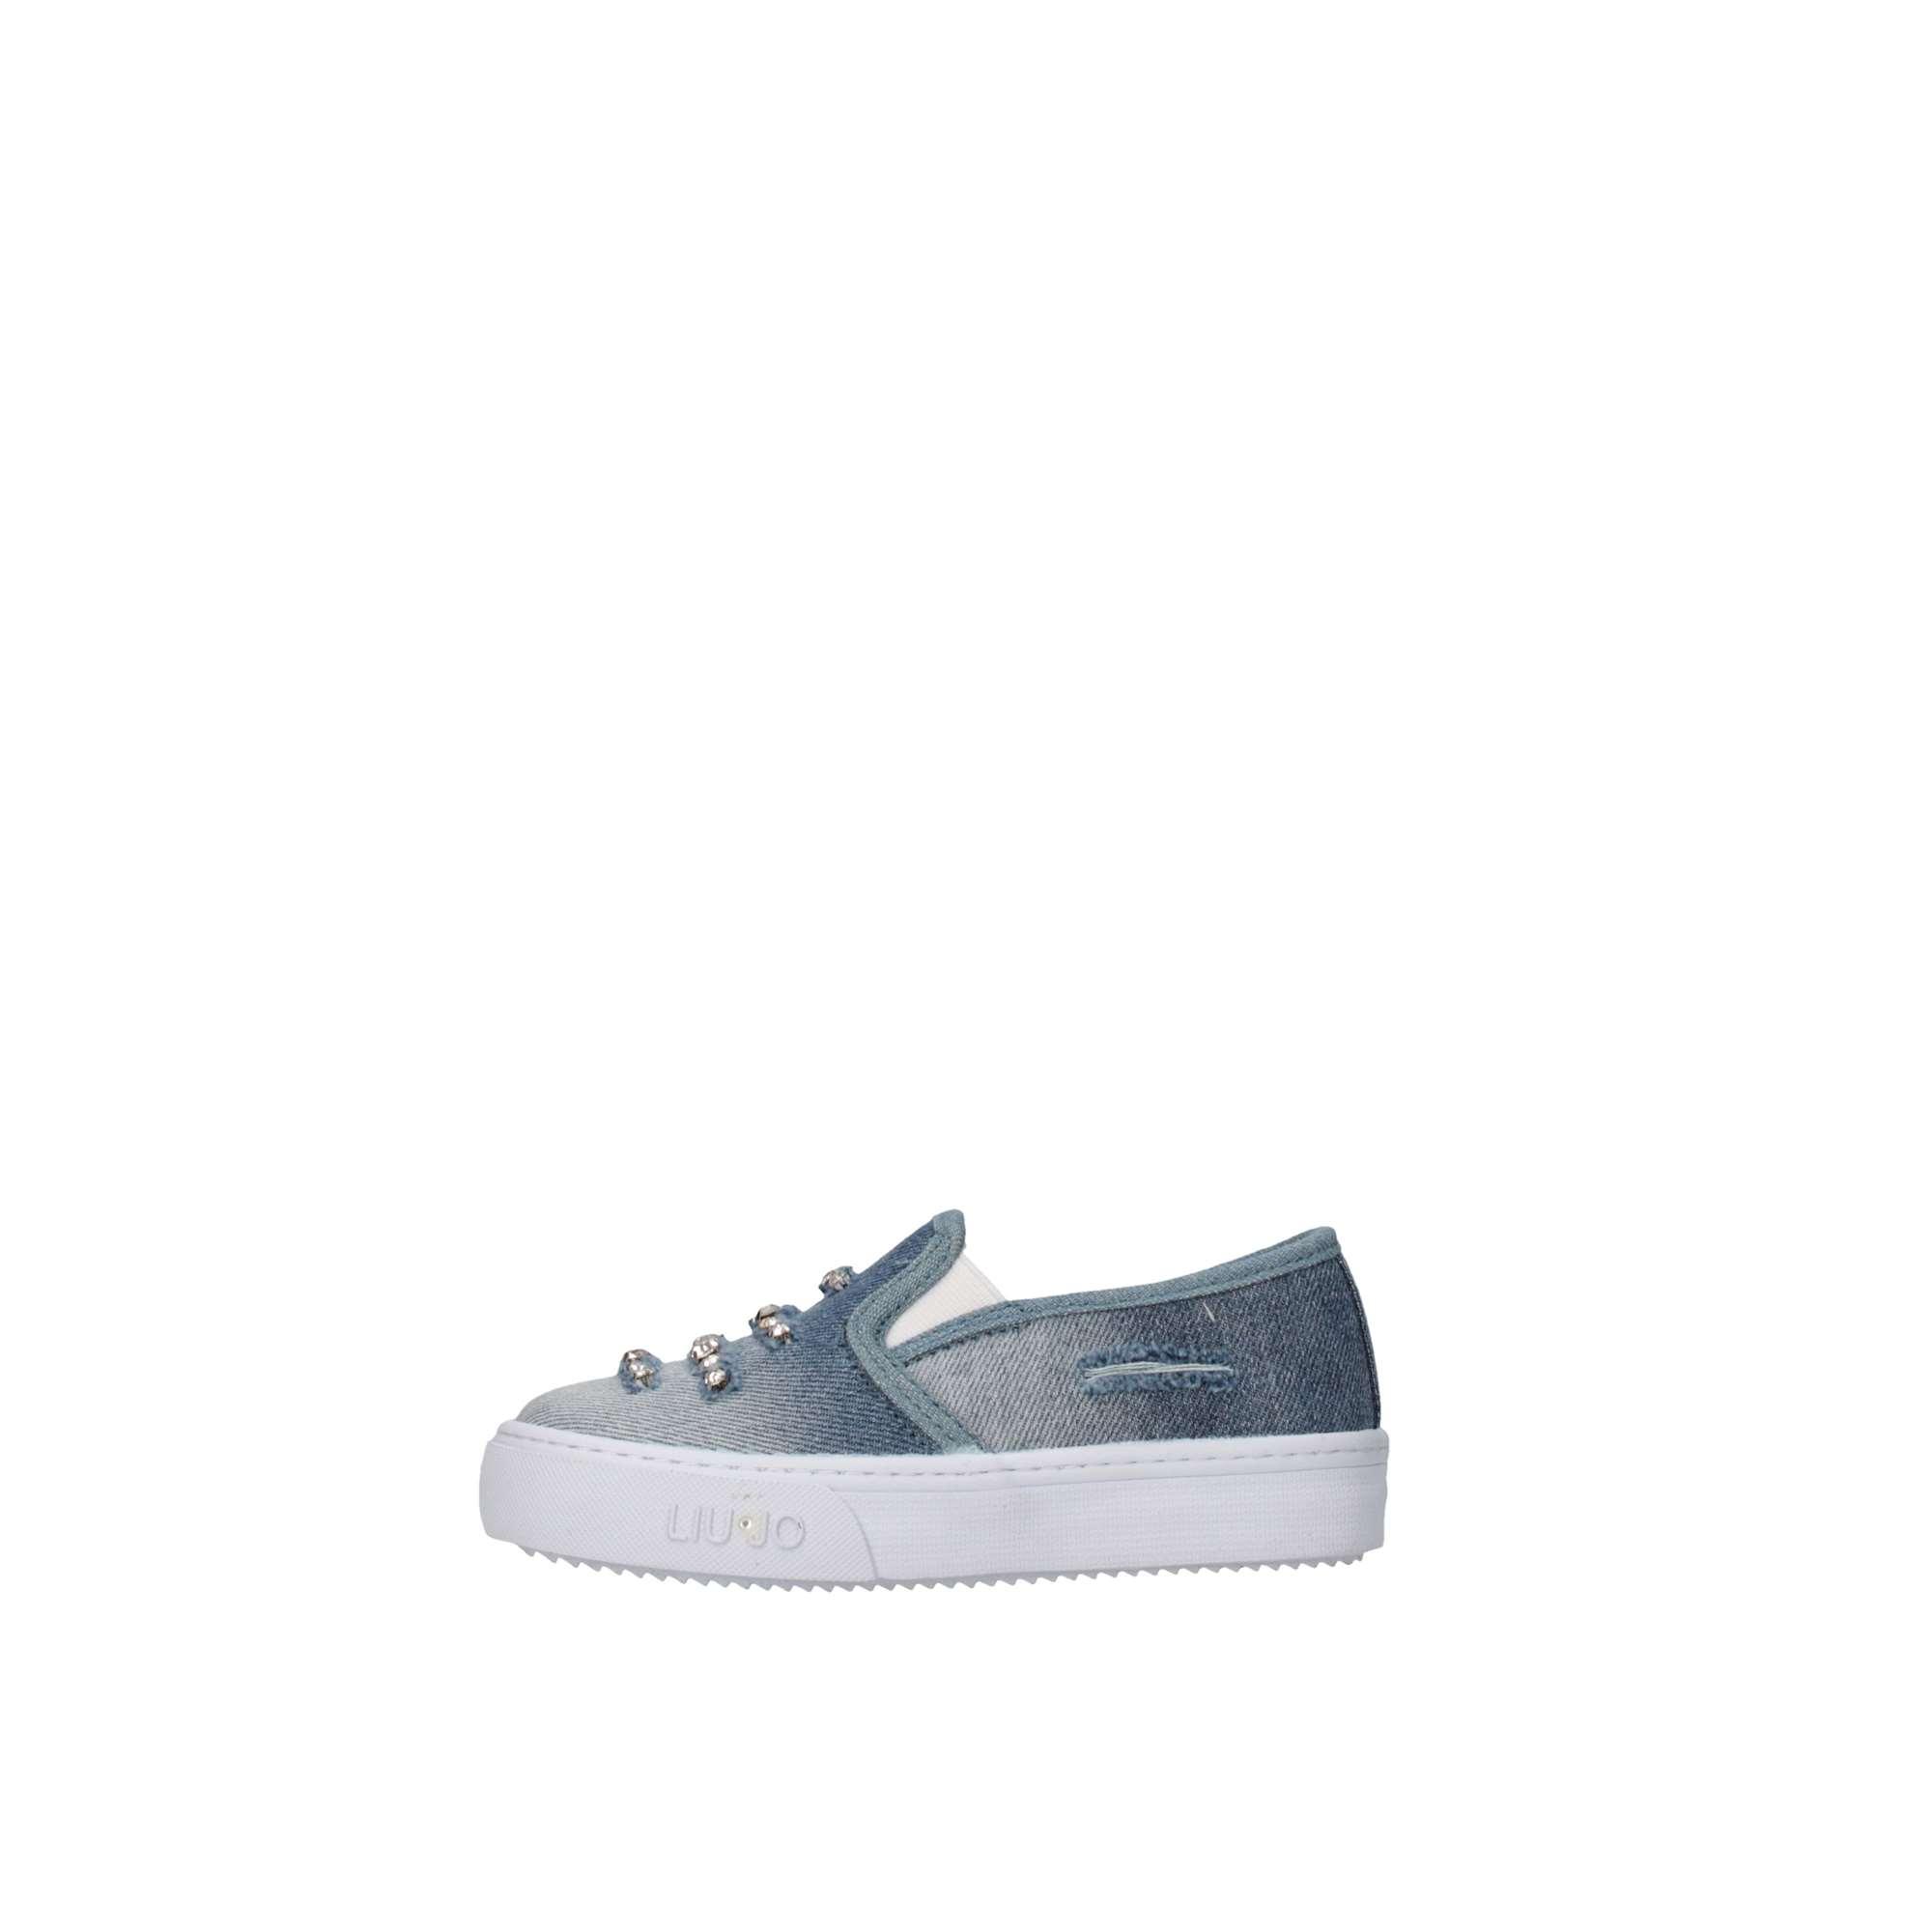 ... Liu Jo Girl UM22904 Jeans Scarpe Bambina ... f43498d260f